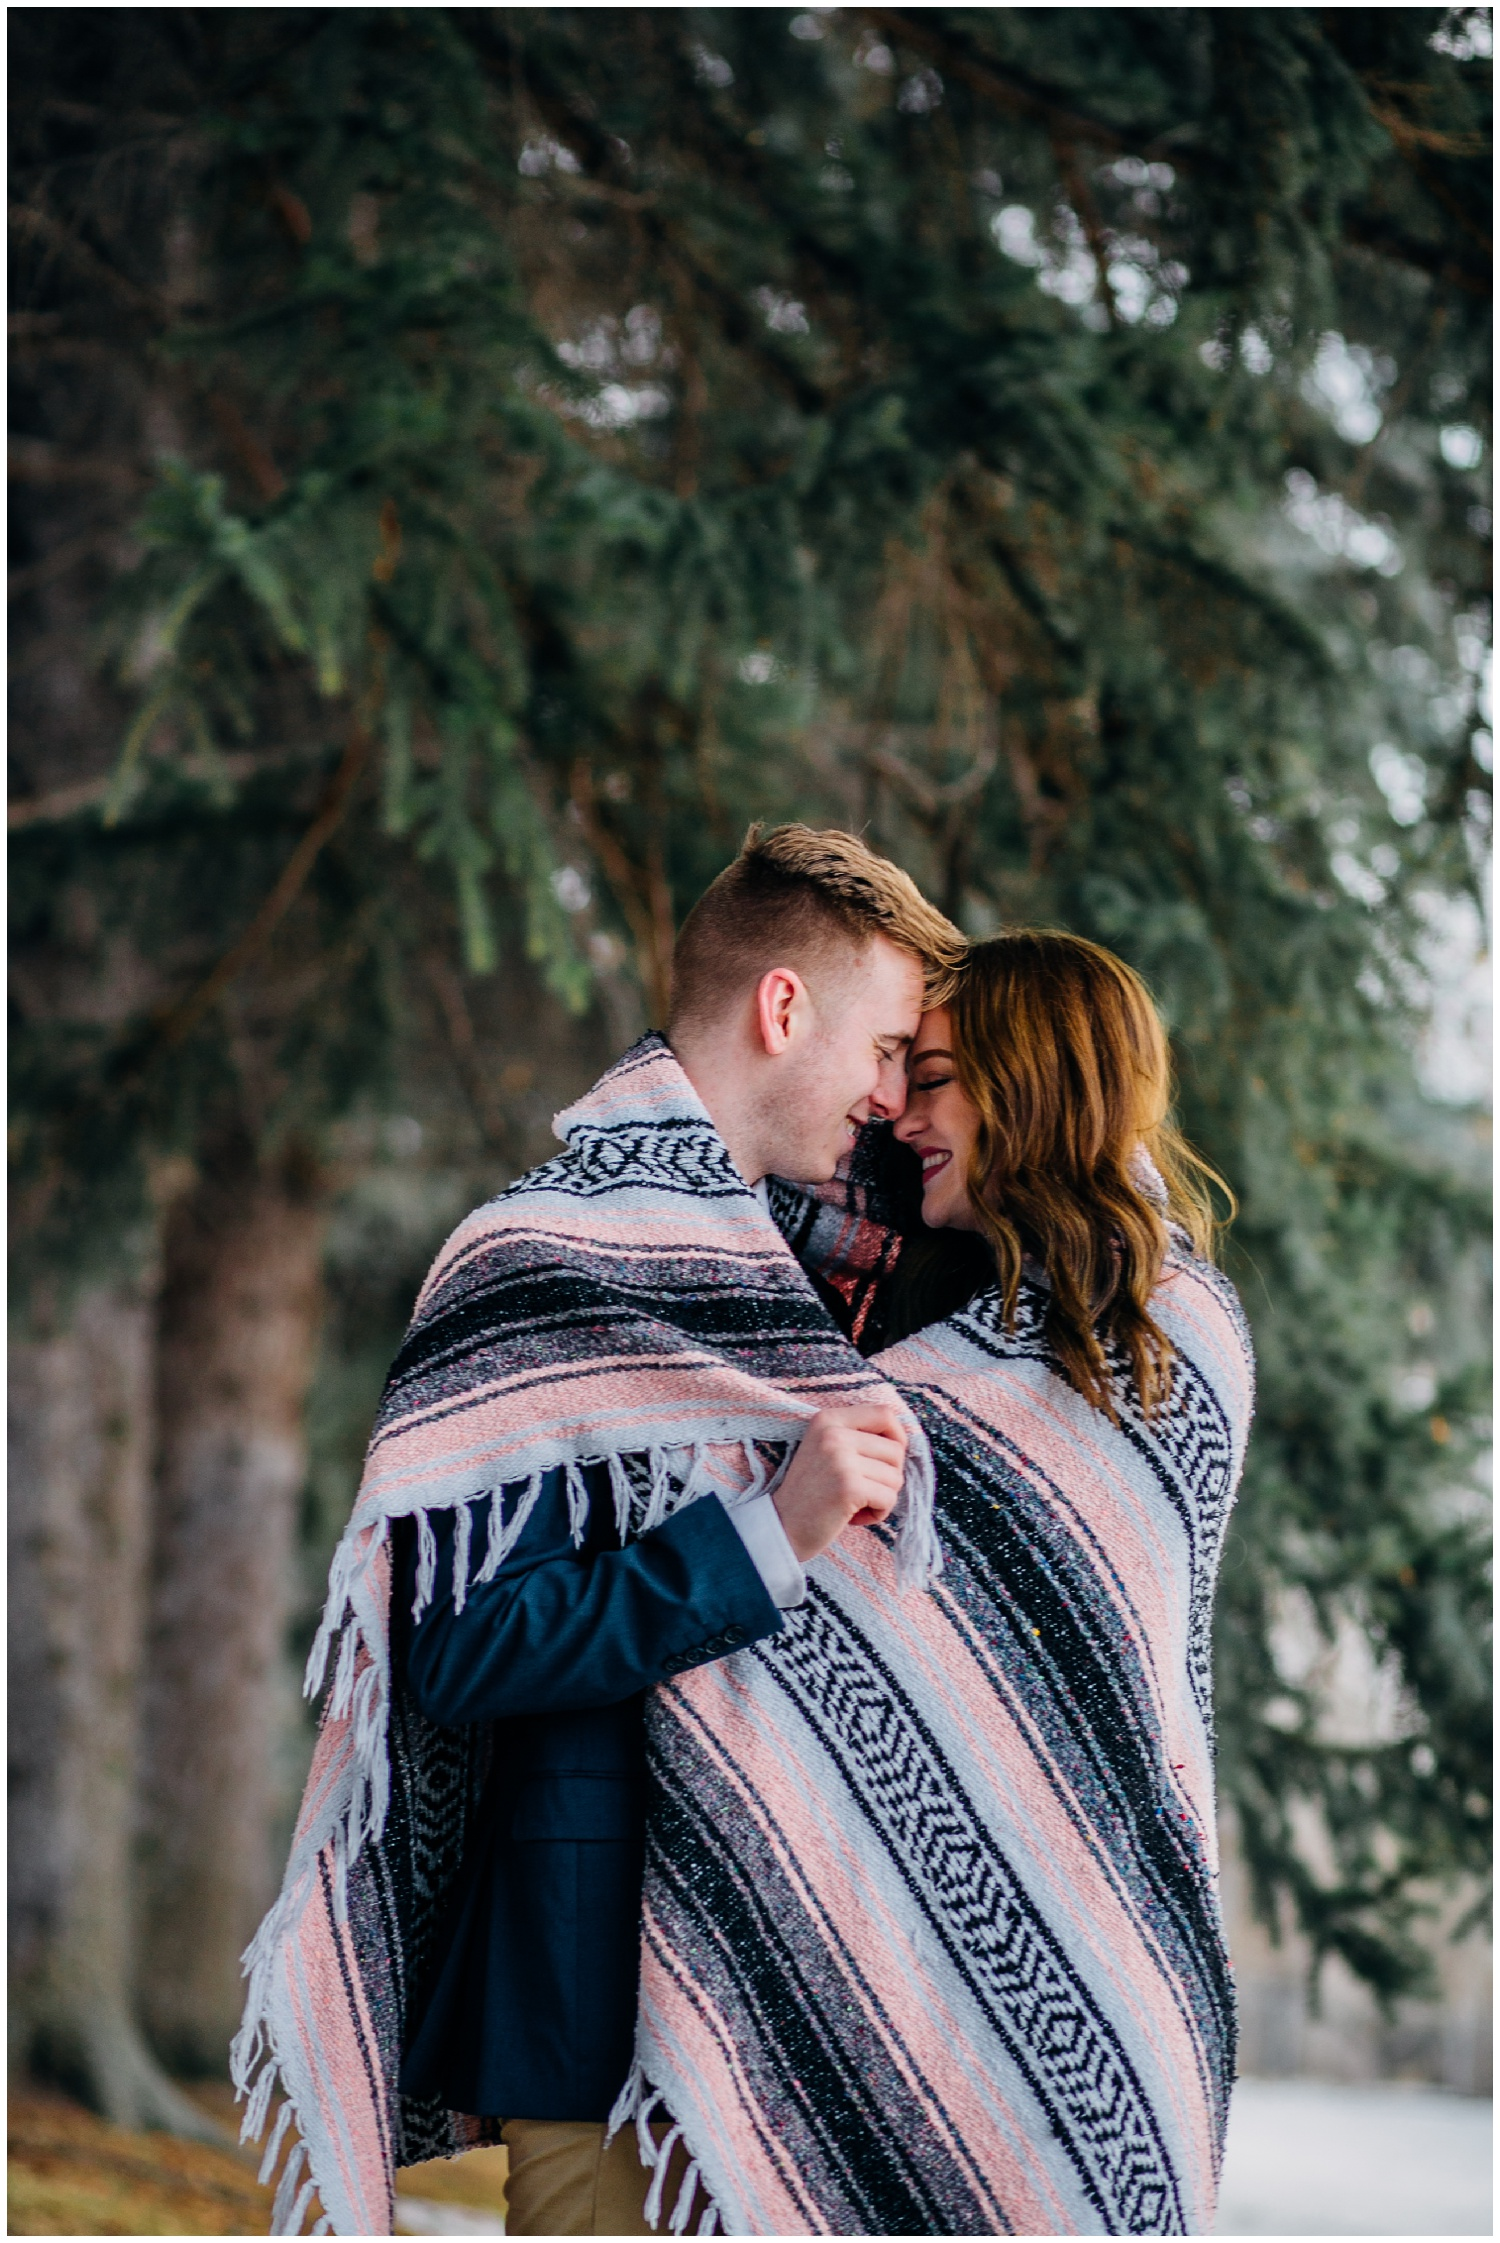 idaho-falls-wedding-photographer-mountain-adventure-engagements-rexburg-pocatello-wyoming-utah_1903.jpg